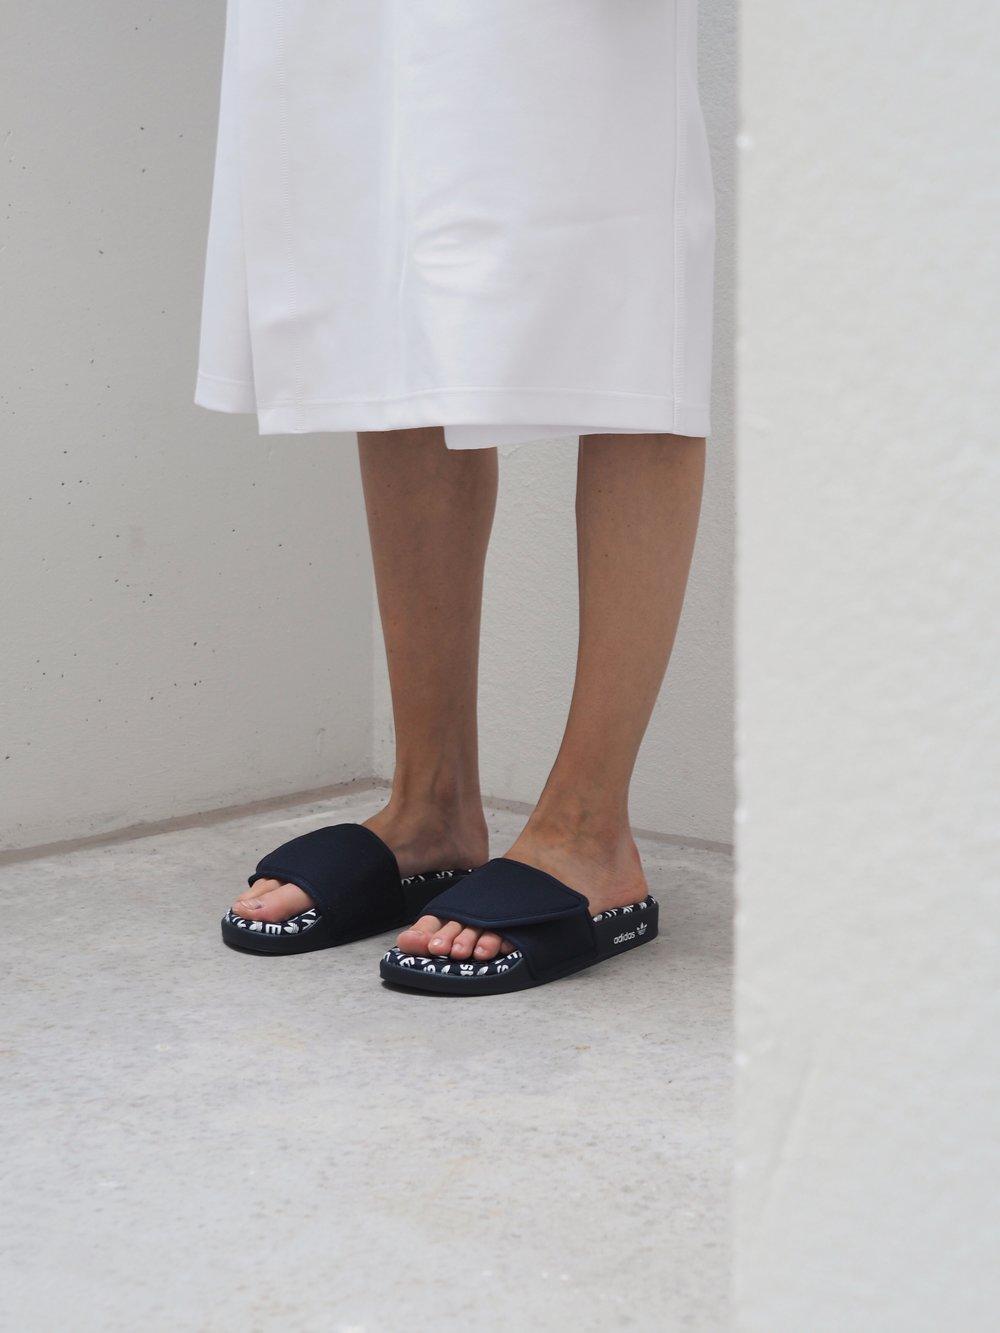 Adidas_NanaHagel3.JPG